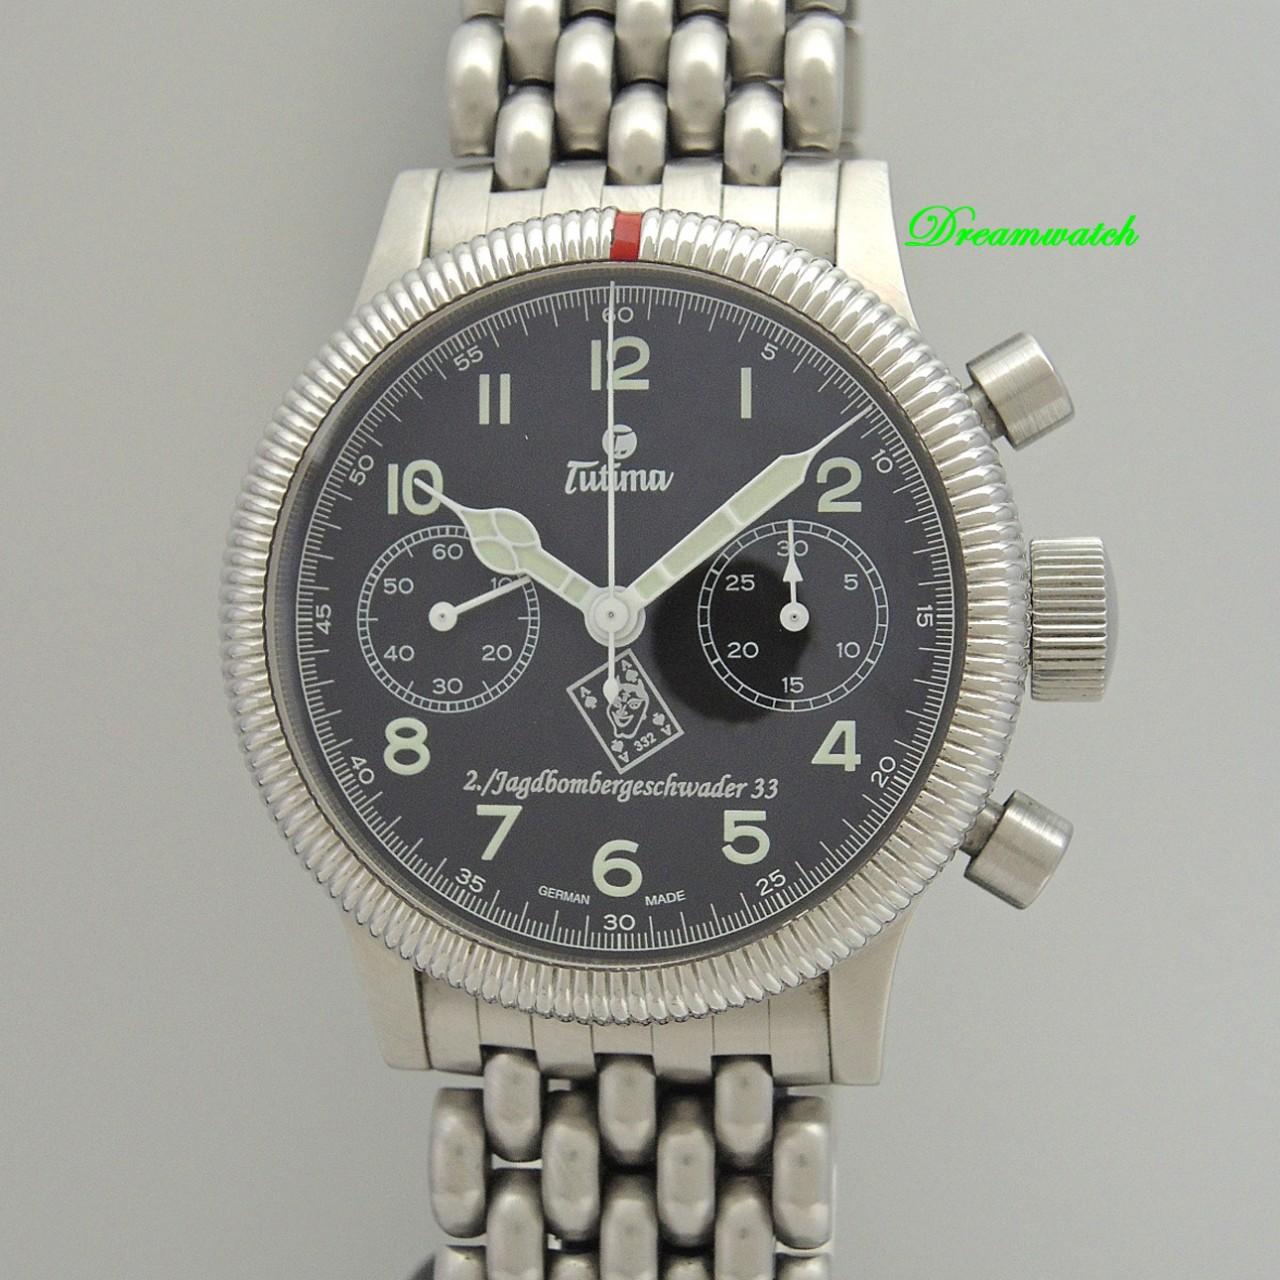 Tutima Fliegerchrono Jagdbombergeschwader 33 Chronograph -Stahl/ Stahl, B&P